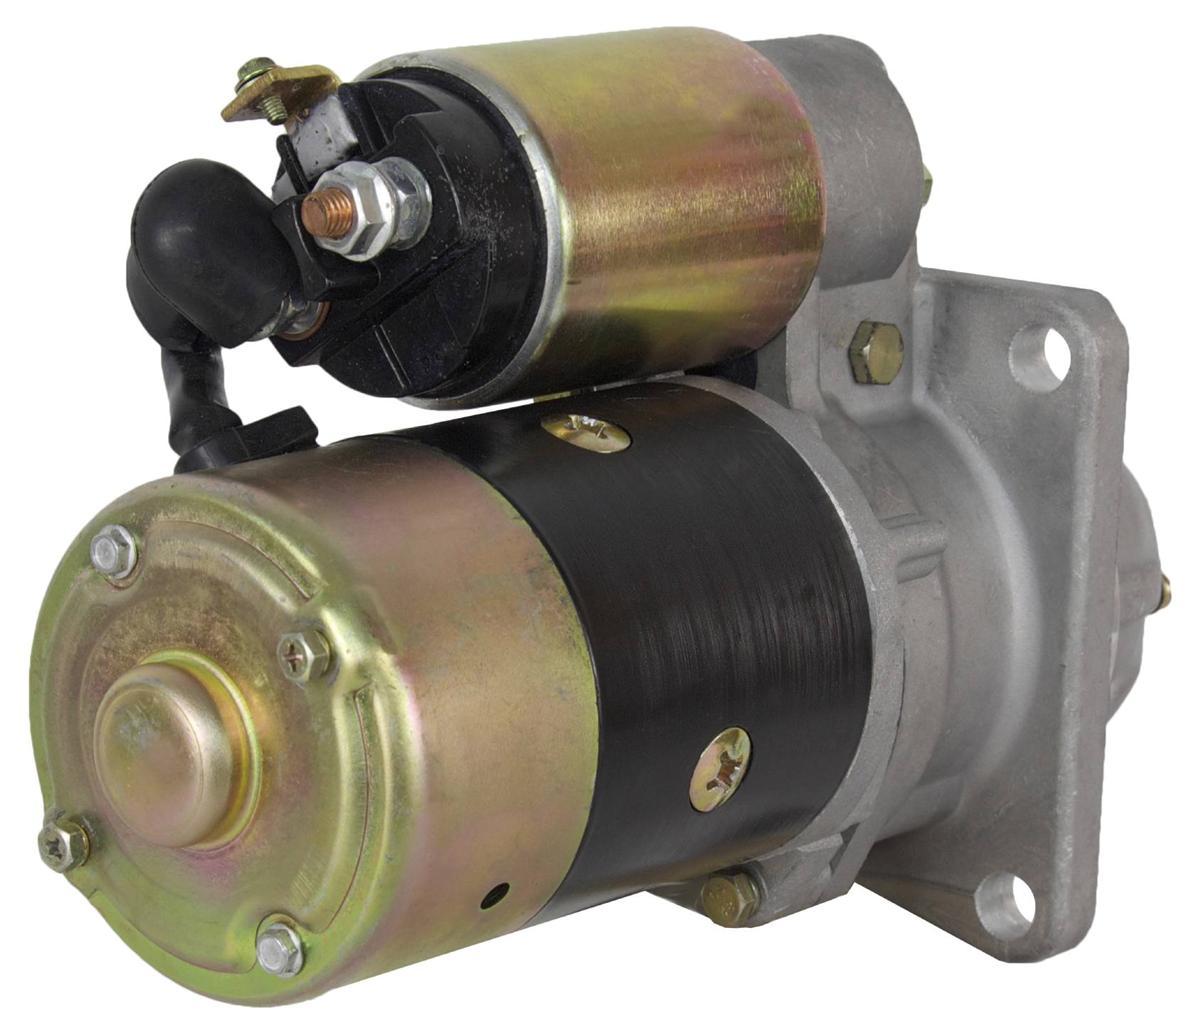 New gear reduction starter motor link belt excavator for Gear reduction starter motor